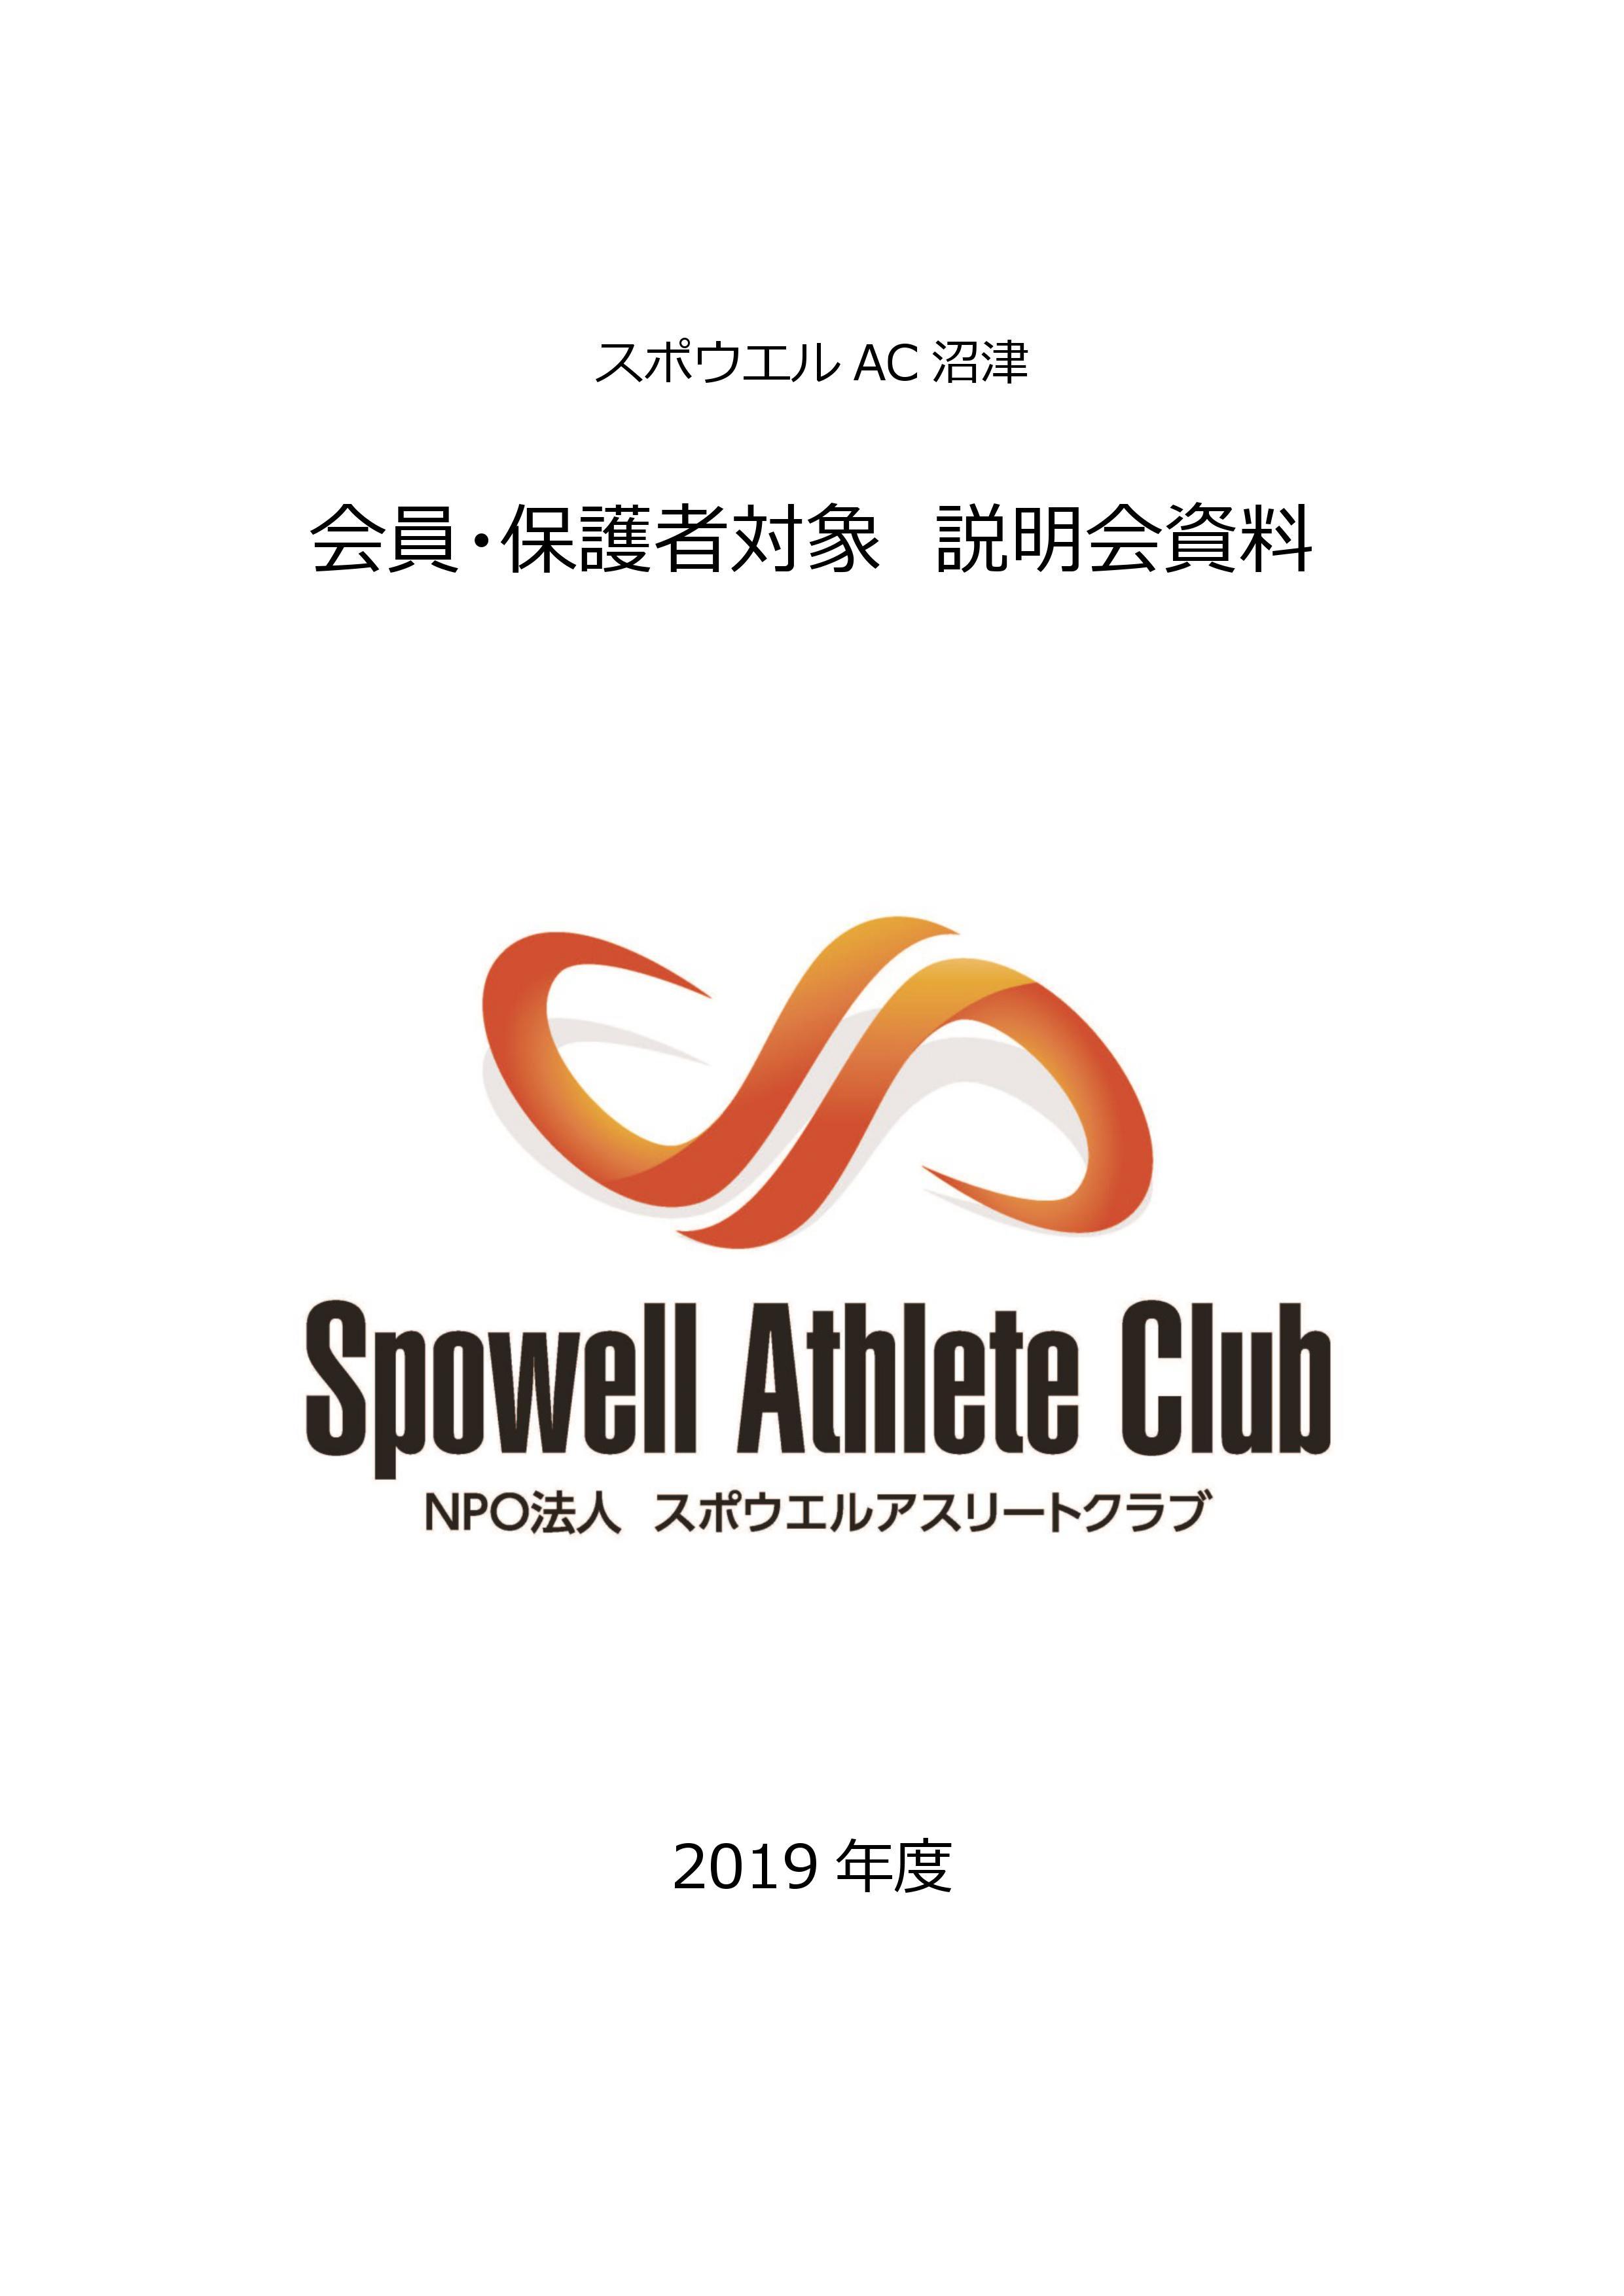 20190311AC沼津説明会資料表紙